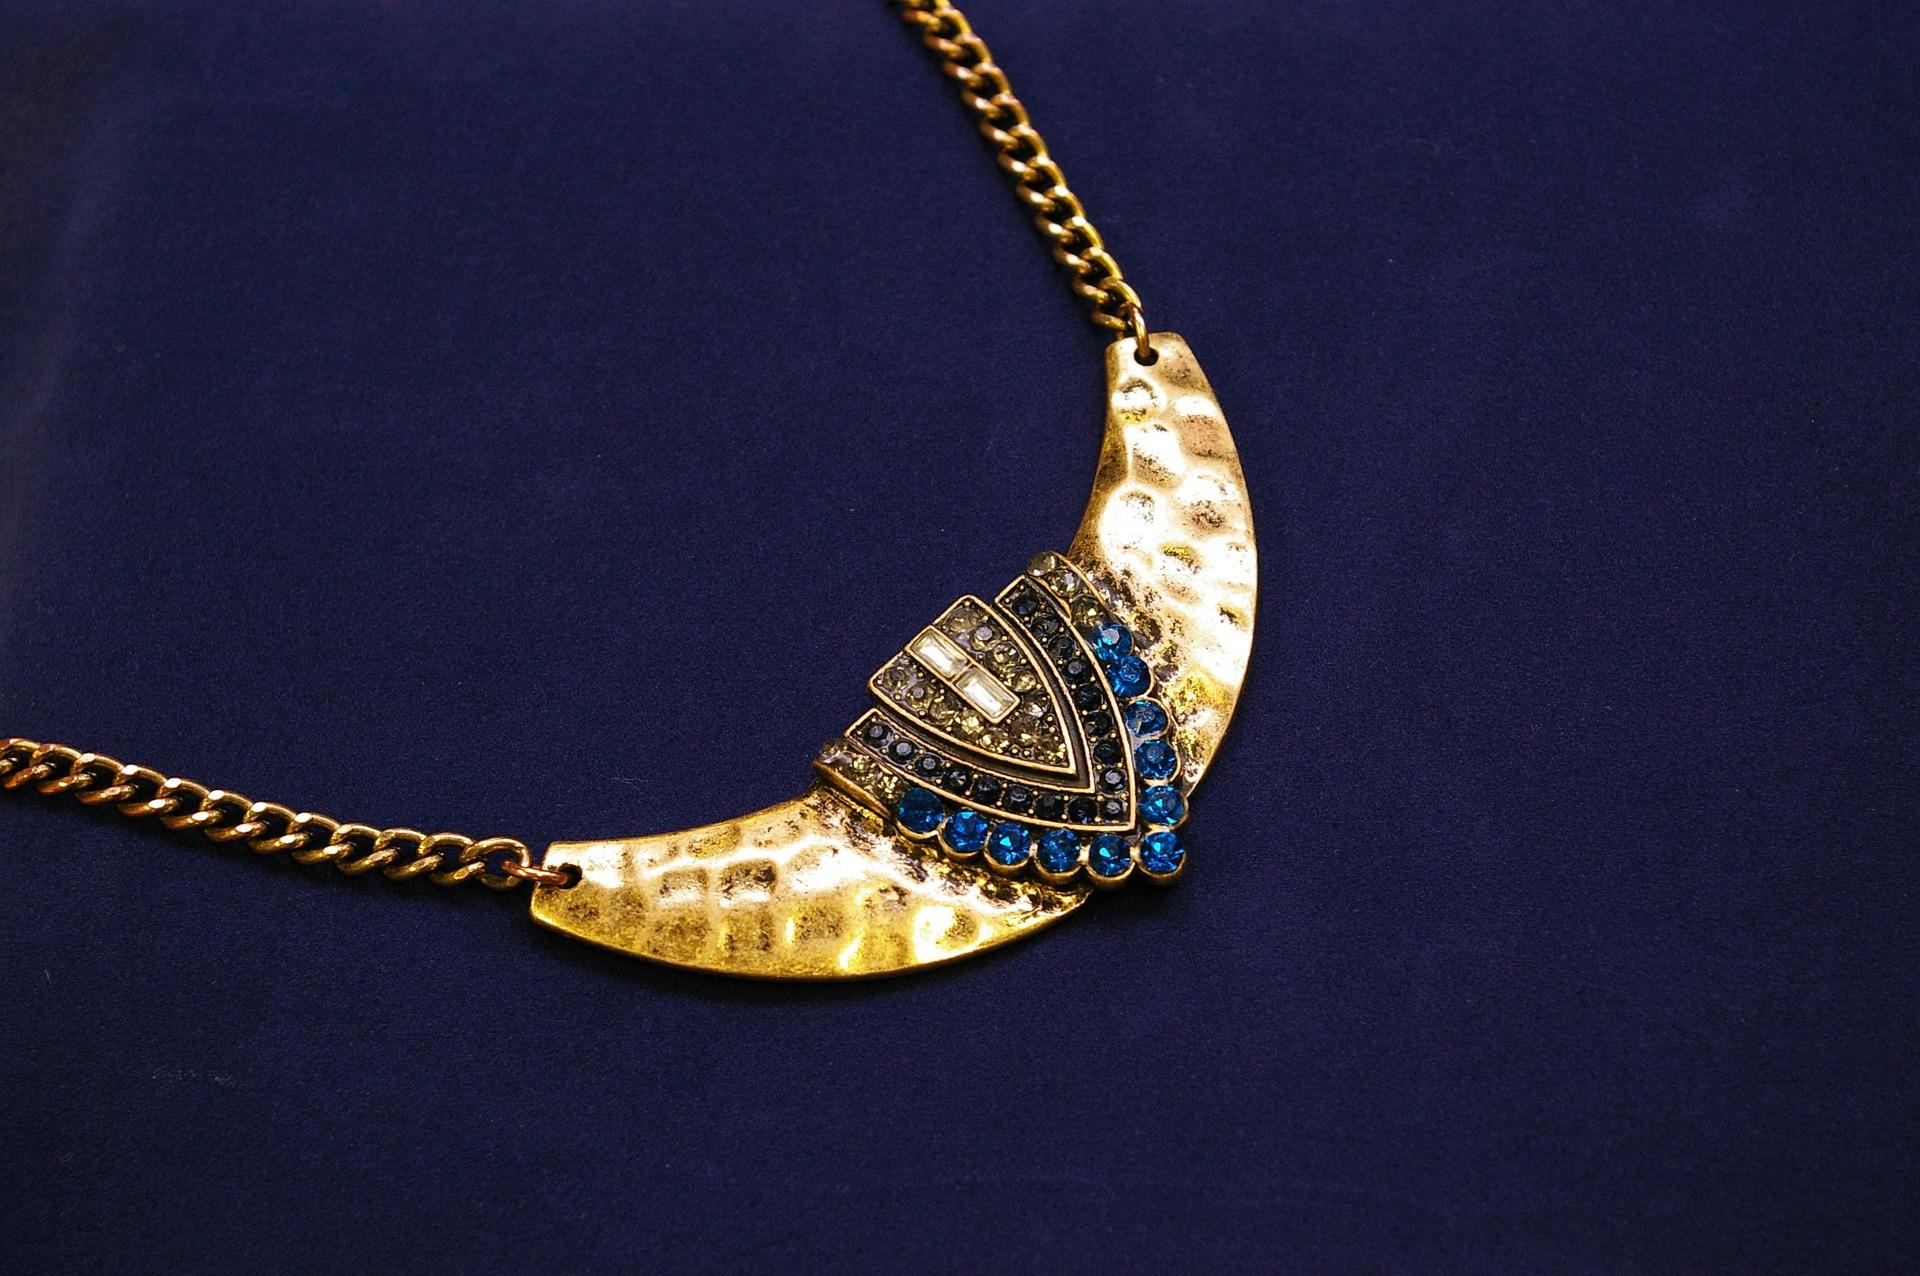 jewellery-810162_1920.jpg